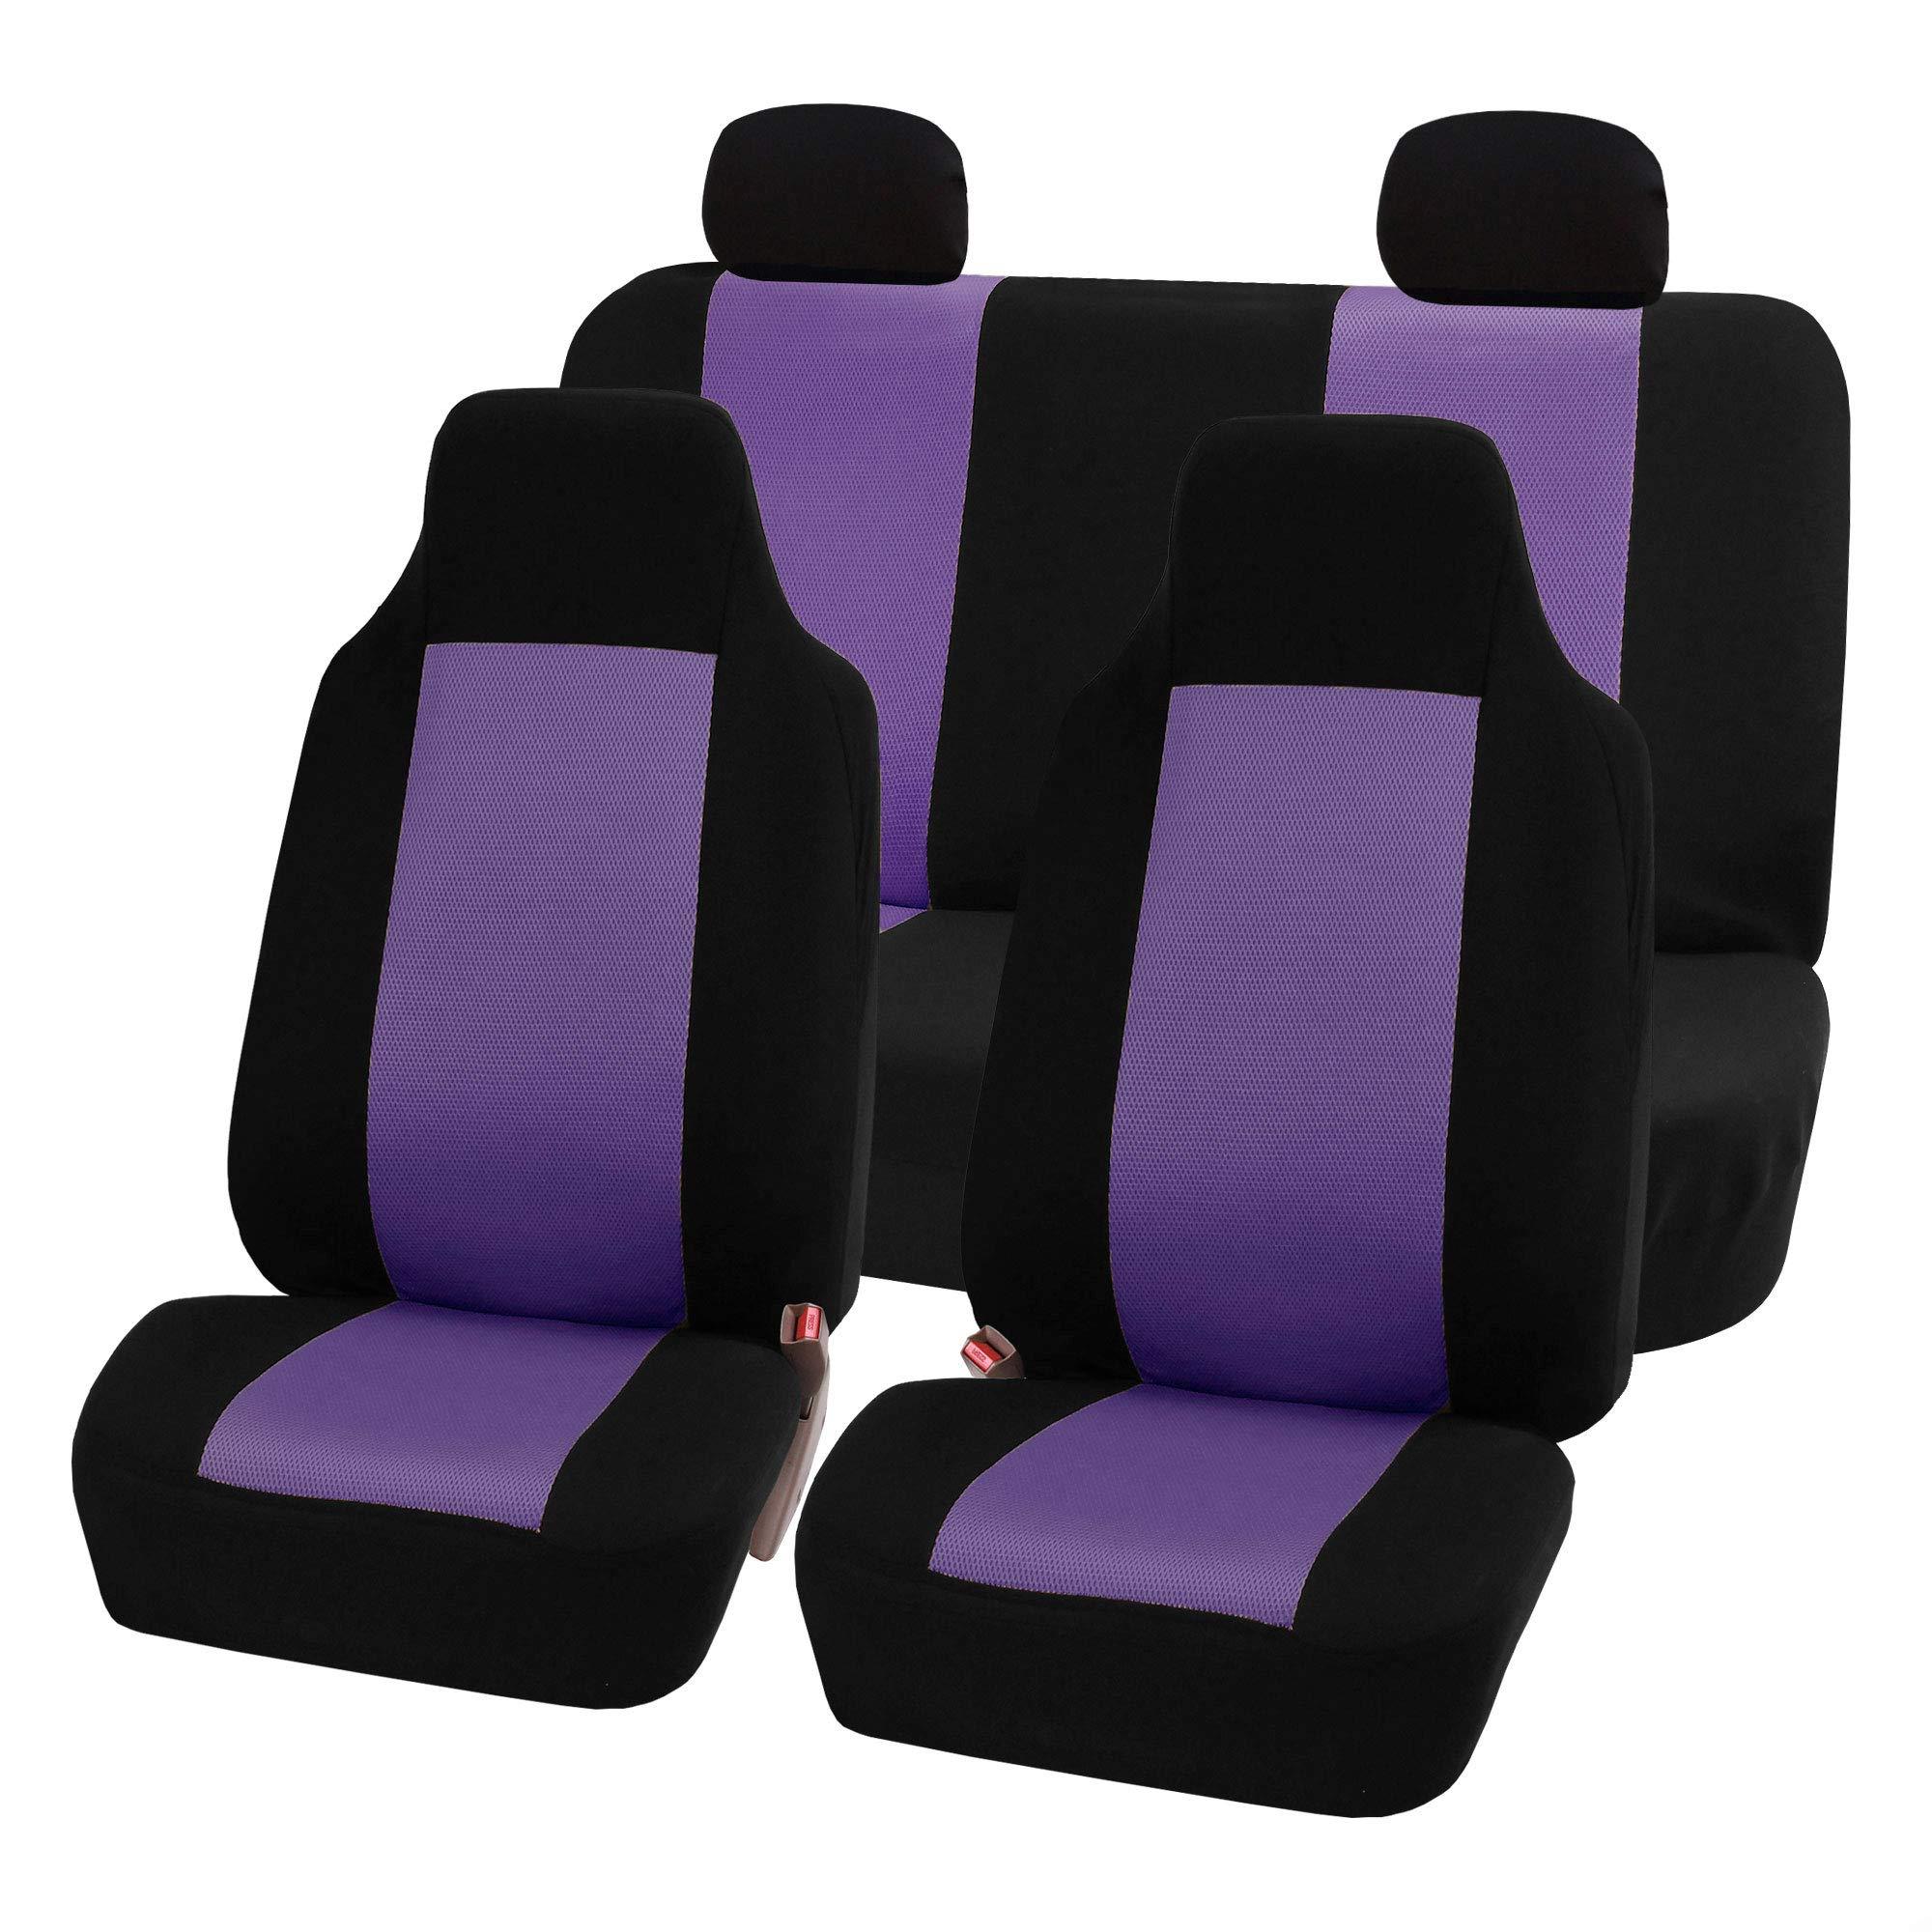 FH Group FB102PURPLE114-AVC FB102PURPLE114 Classic Full Set High Back Flat Cloth Seat Covers, Purple/Black-Fit Most Car, Truck, SUV, or Van